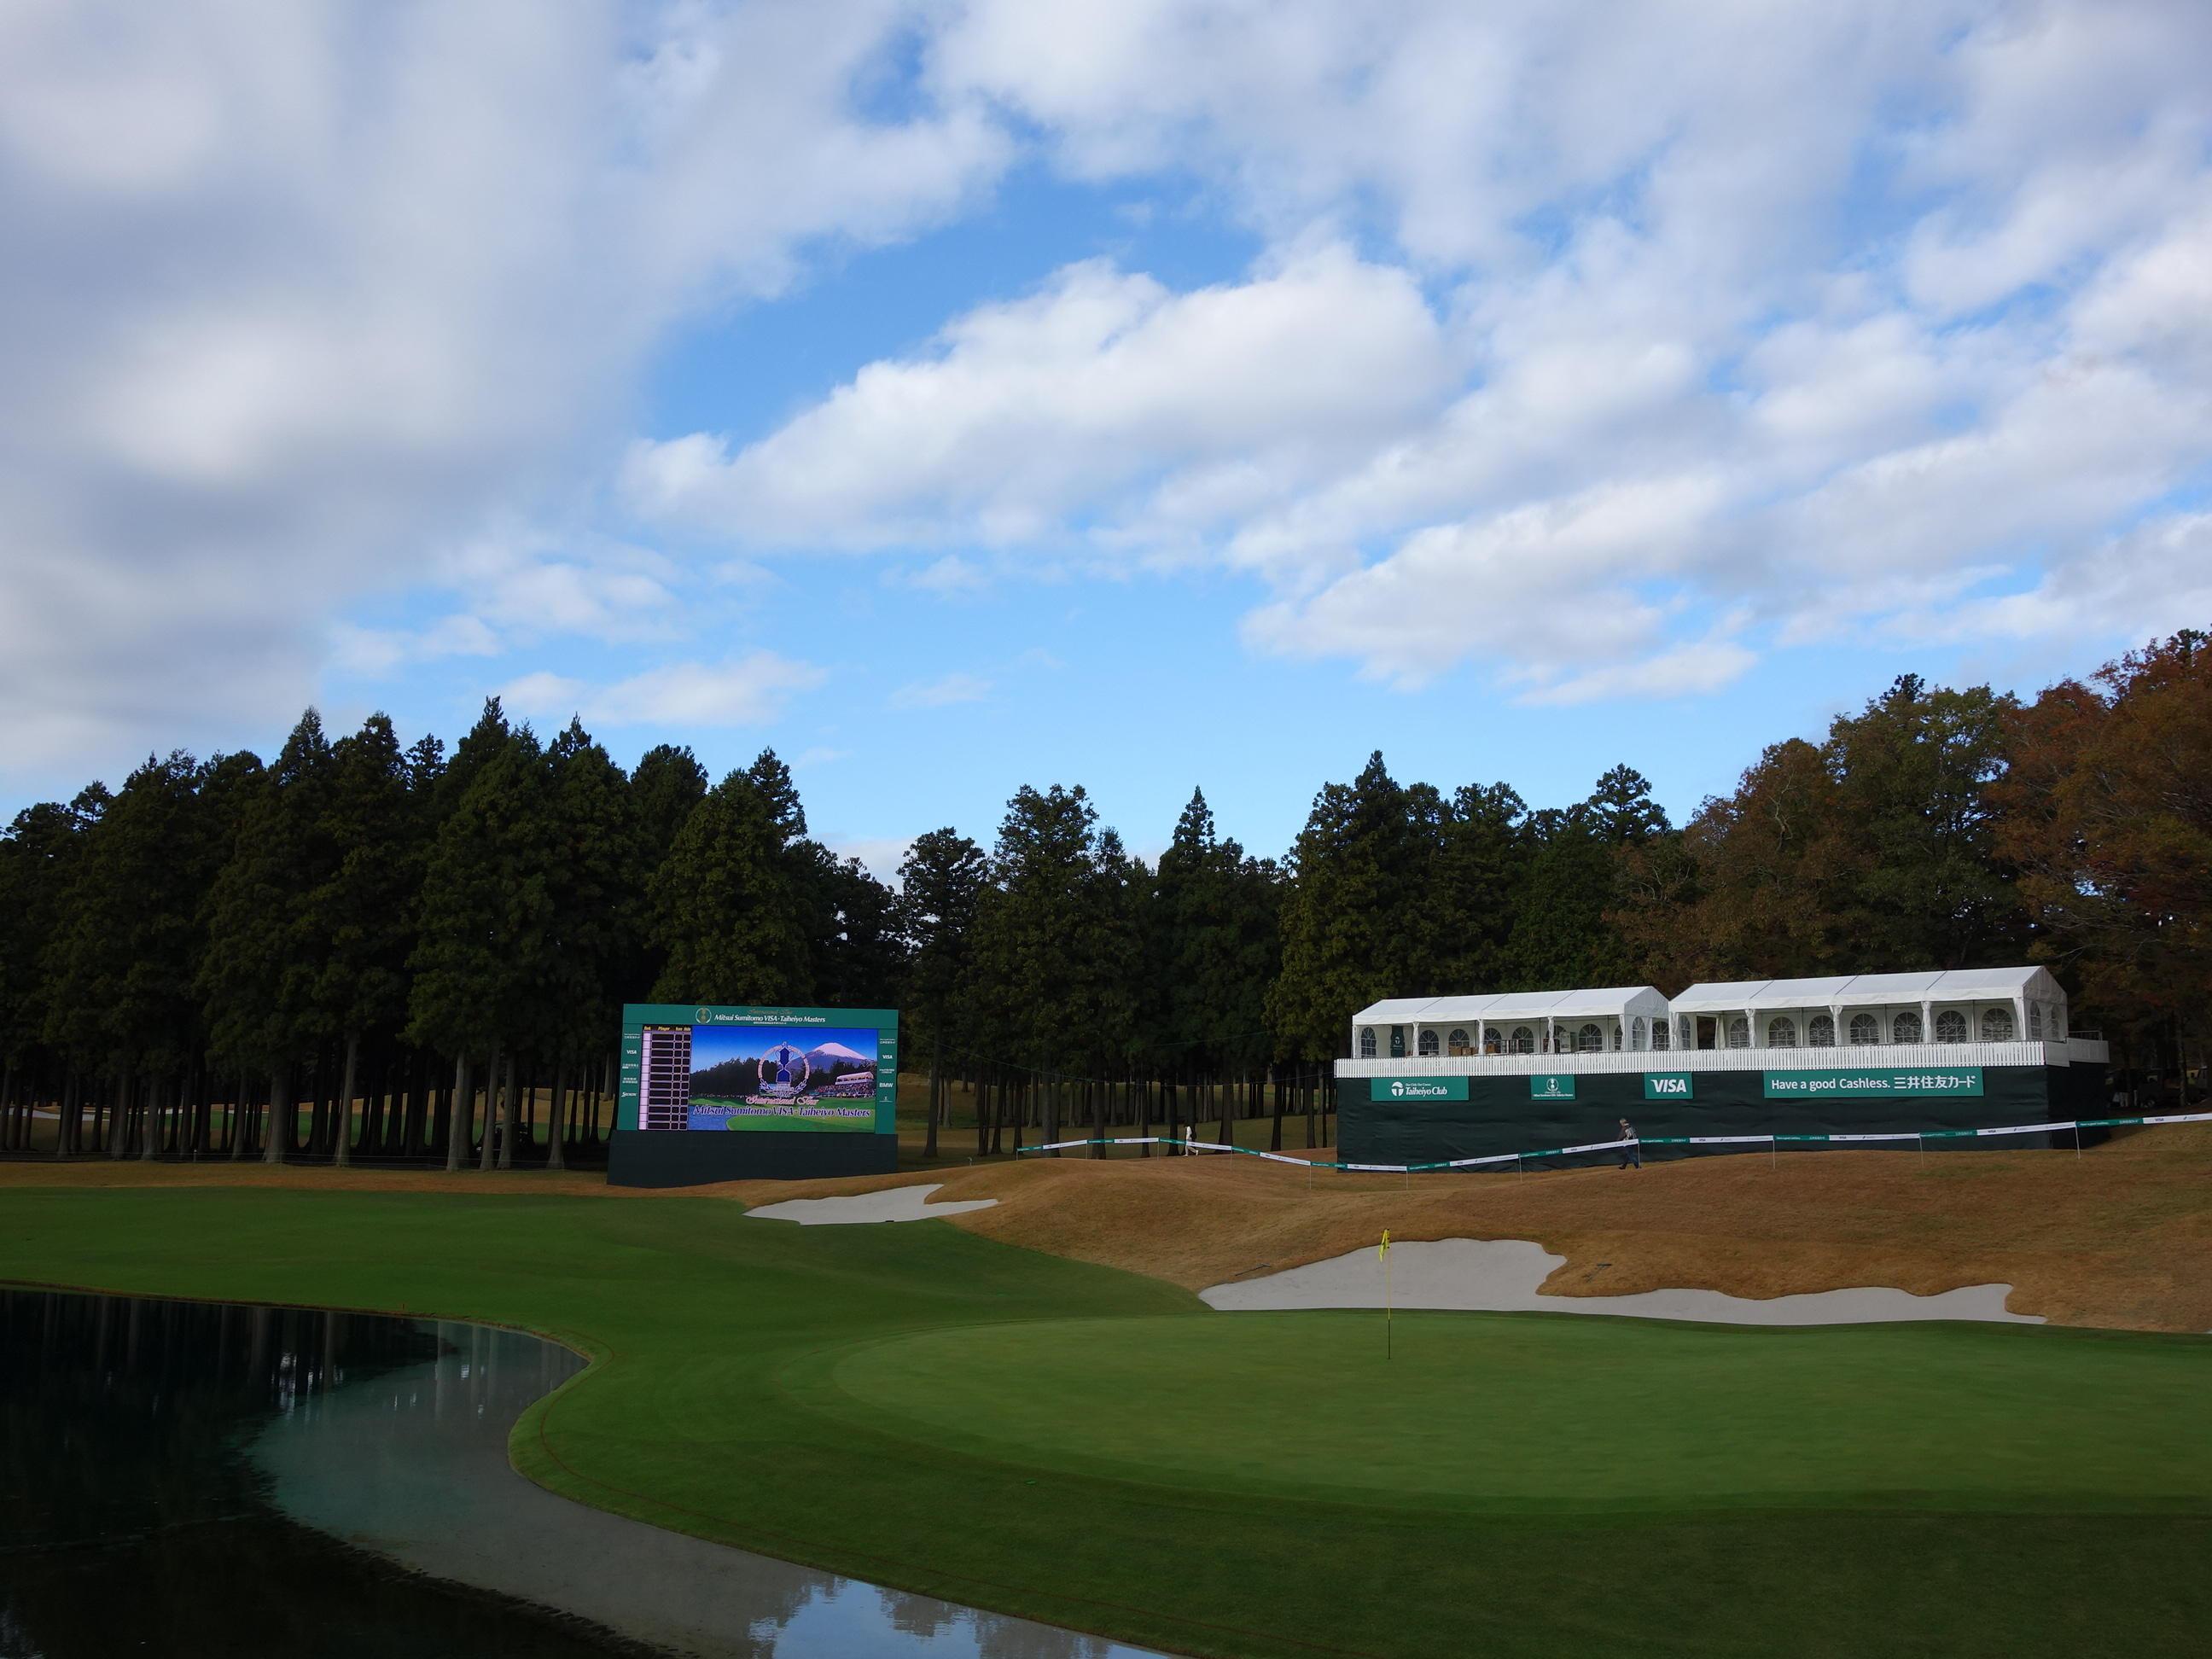 http://www.bs-golf.com/pro/f8c28e39fa932256edc3c596c67cbece4db855d5.JPG